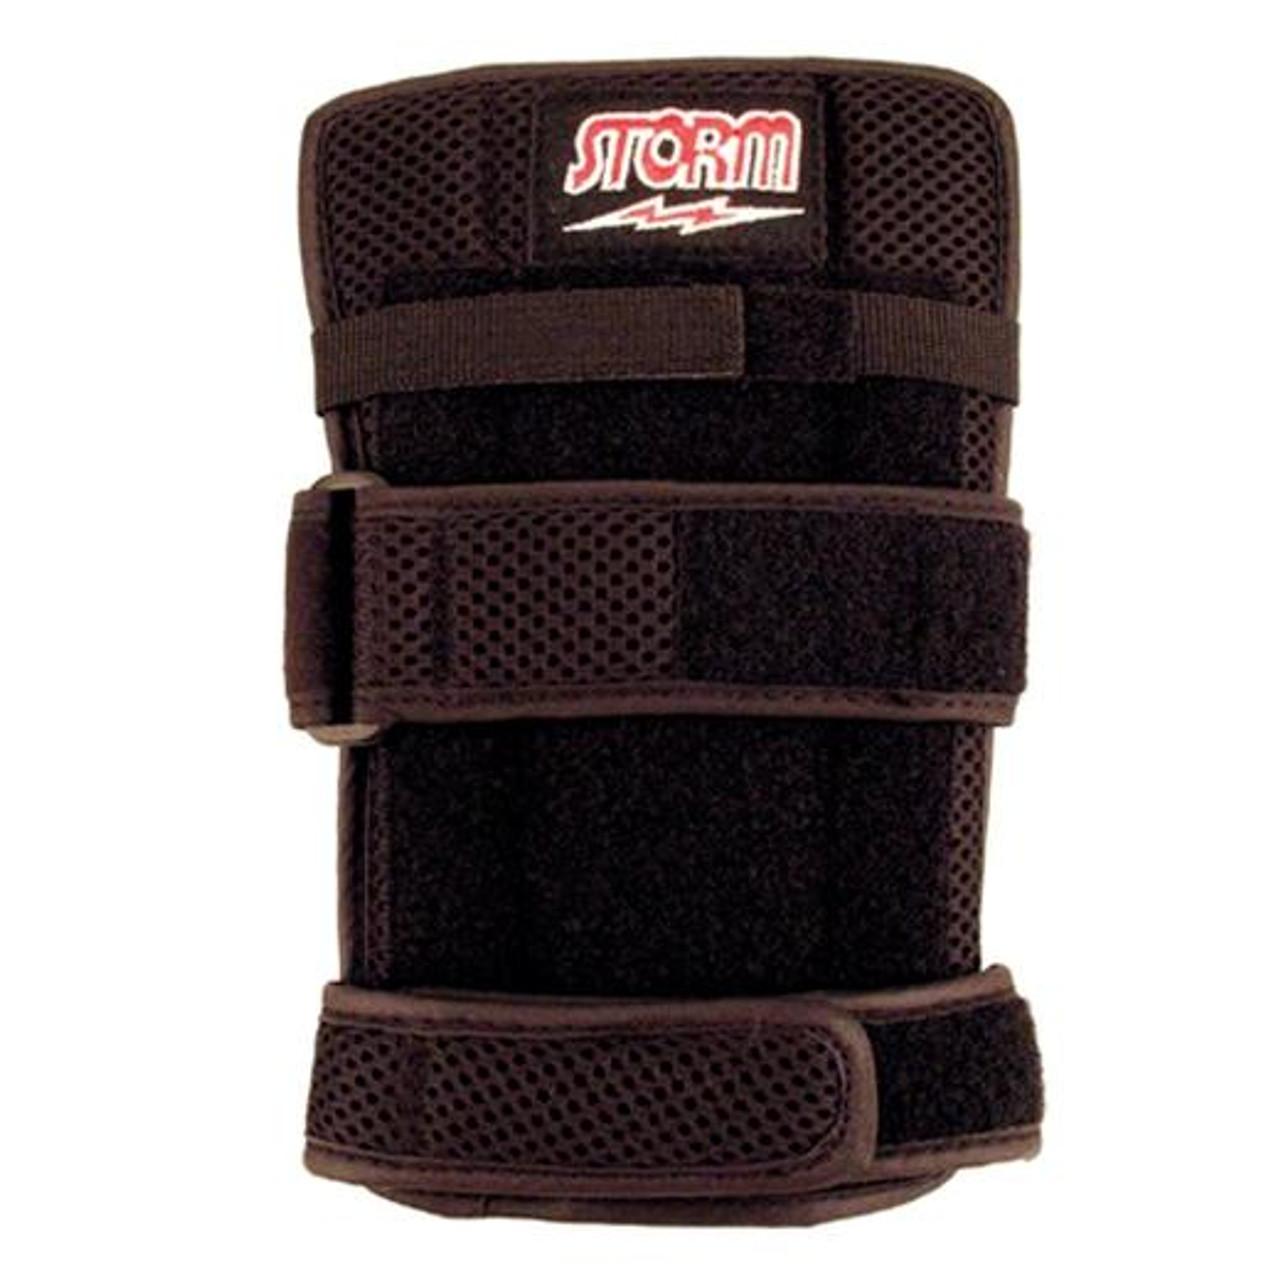 Storm Neoprene Wrist Support